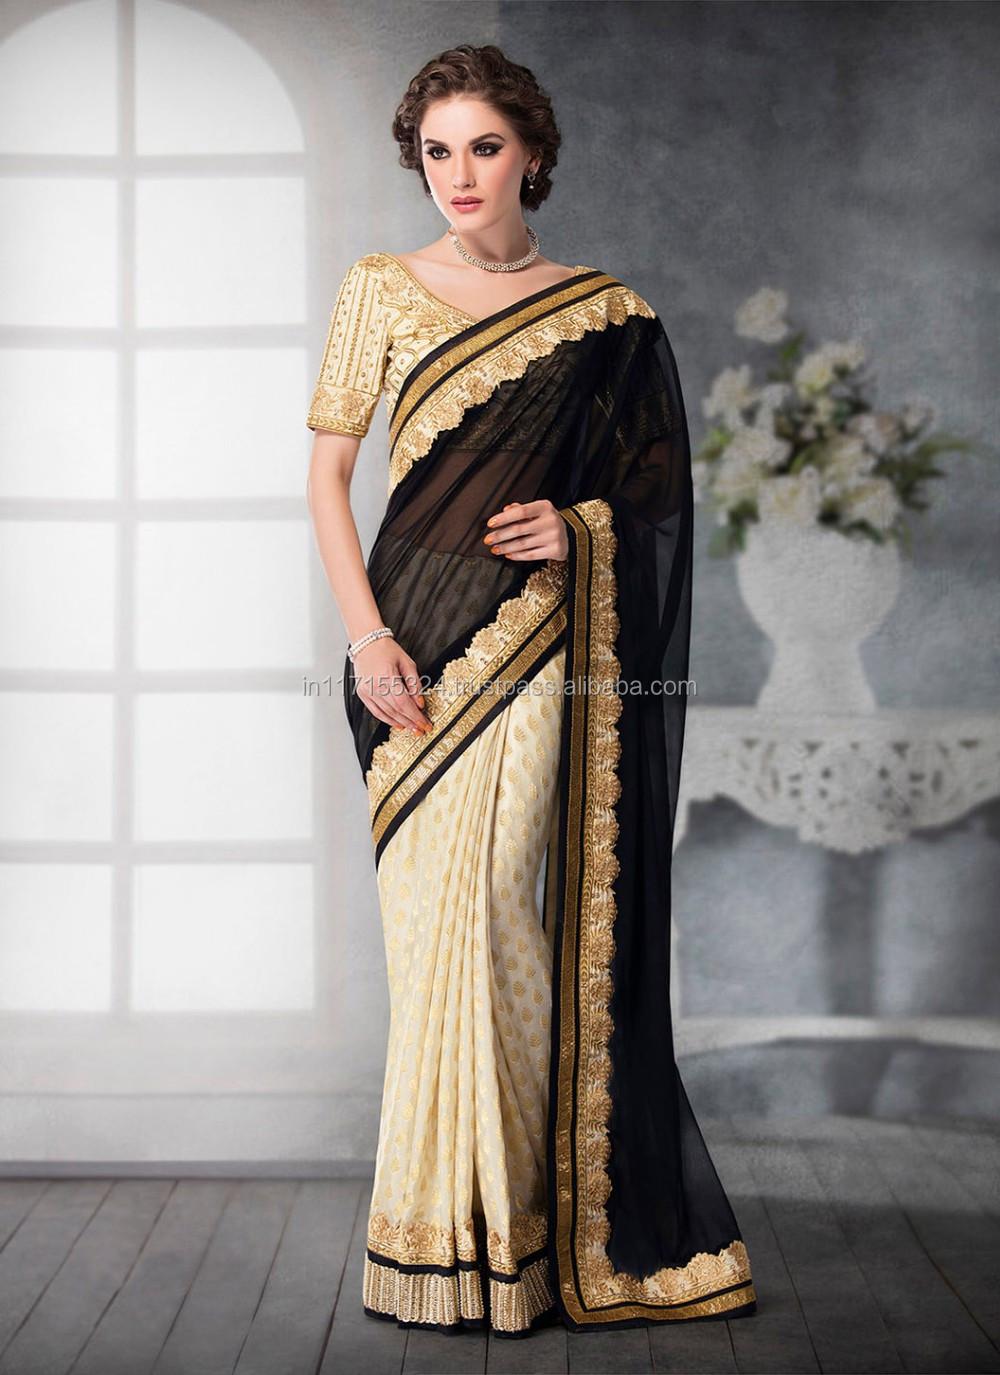 aca5795c714e2 Red festival wear designer saree - Indian buy online shopping saree - Indian  women clothing -